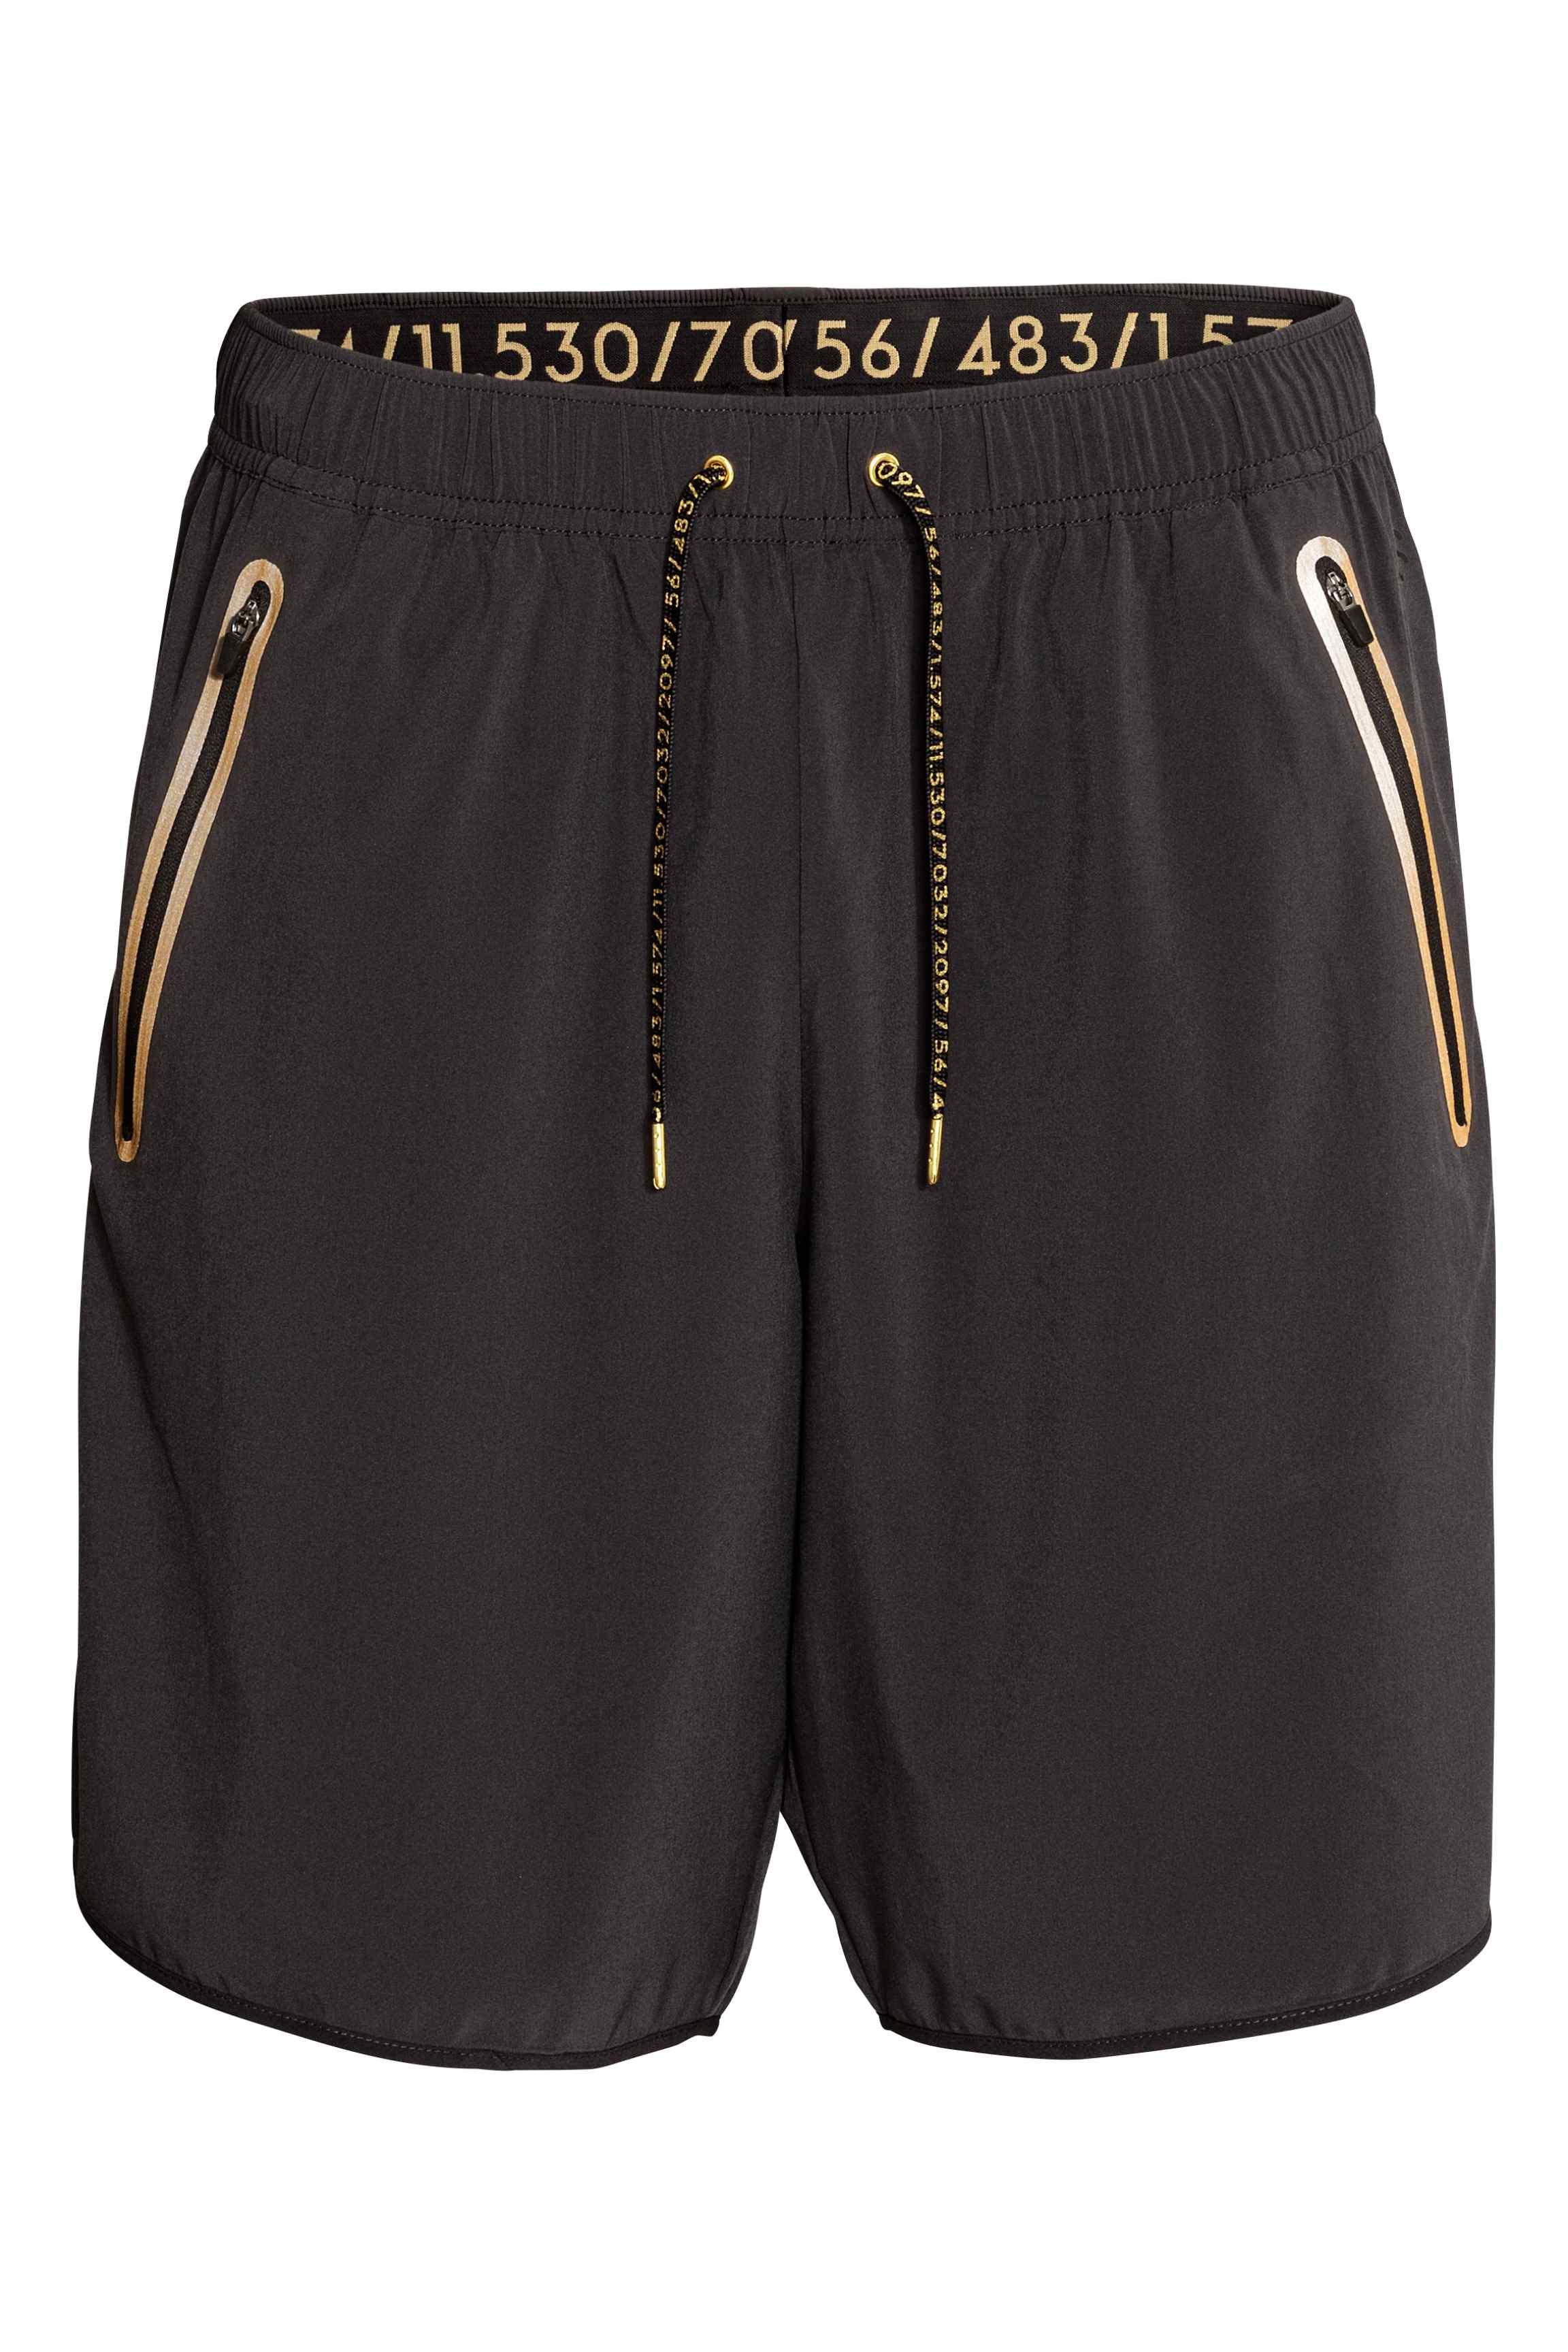 Sports shorts, £24.99 ( hm.com )